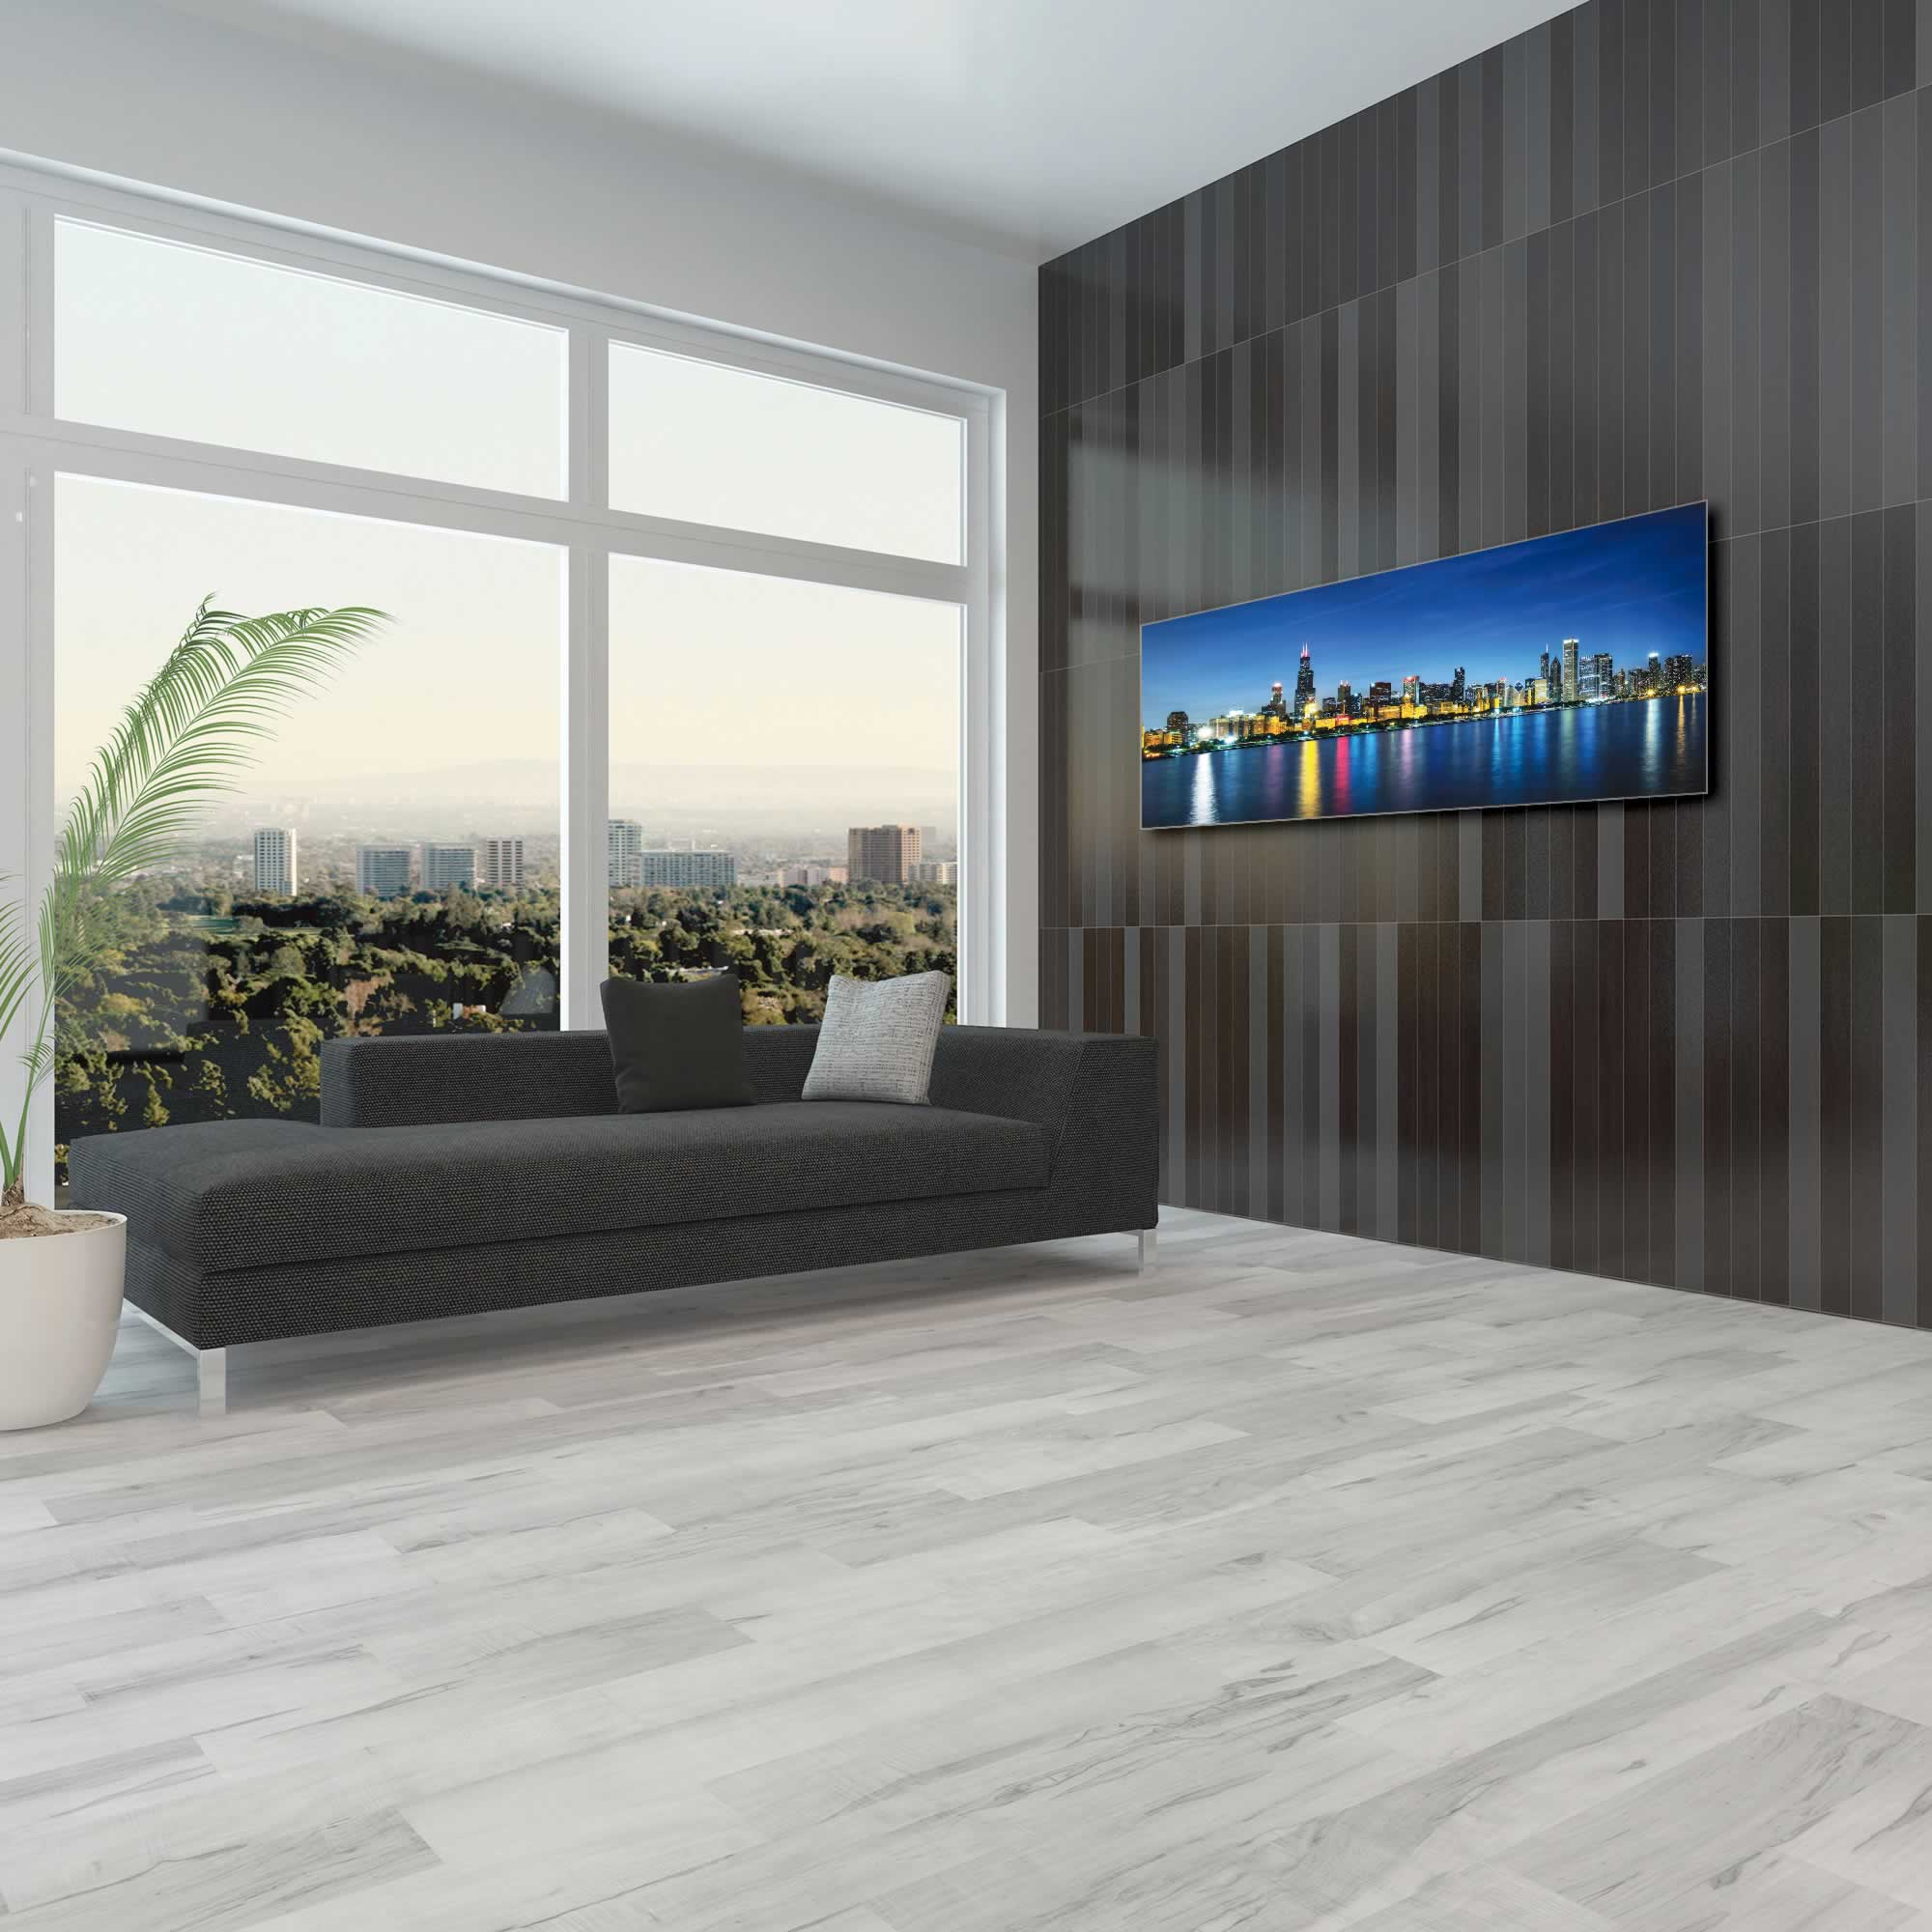 Chicago City Skyline - Urban Modern Art, Designer Home Decor, Cityscape Wall Artwork, Trendy Contemporary Art - Alternate View 1